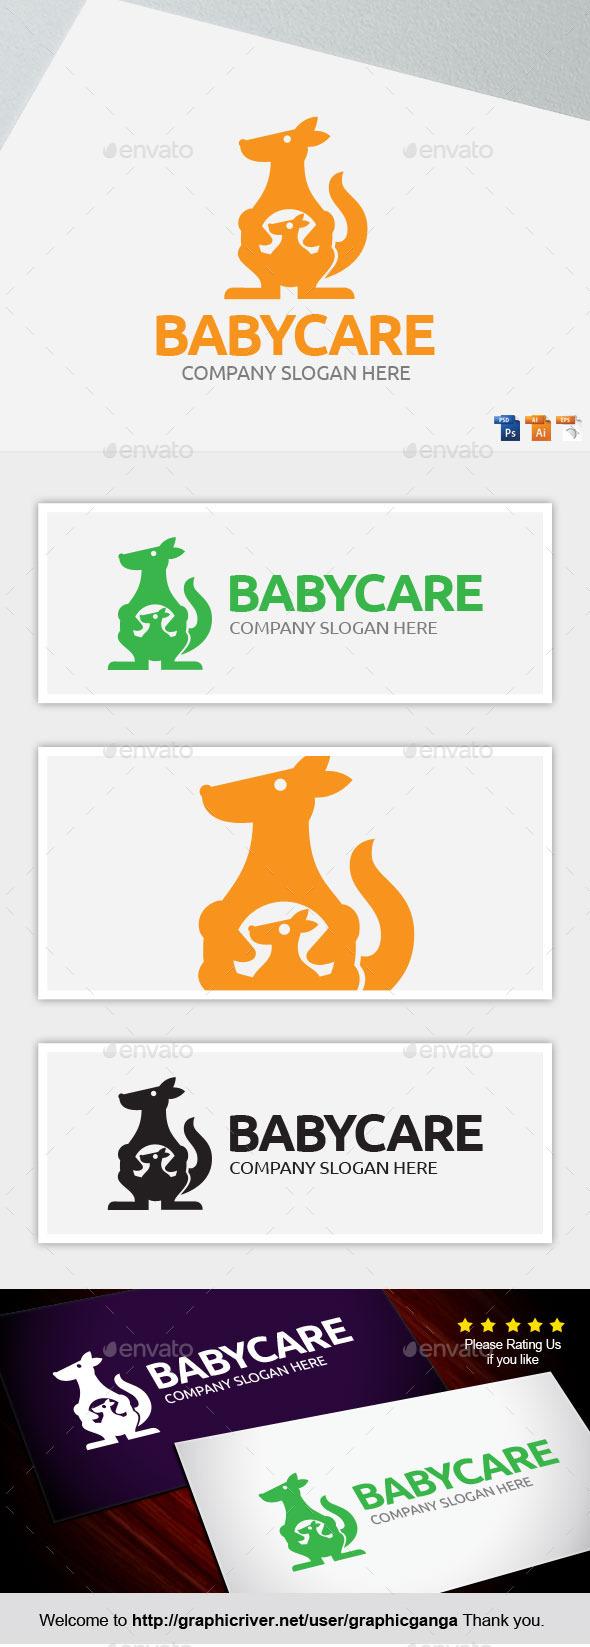 GraphicRiver Babycare 9511926